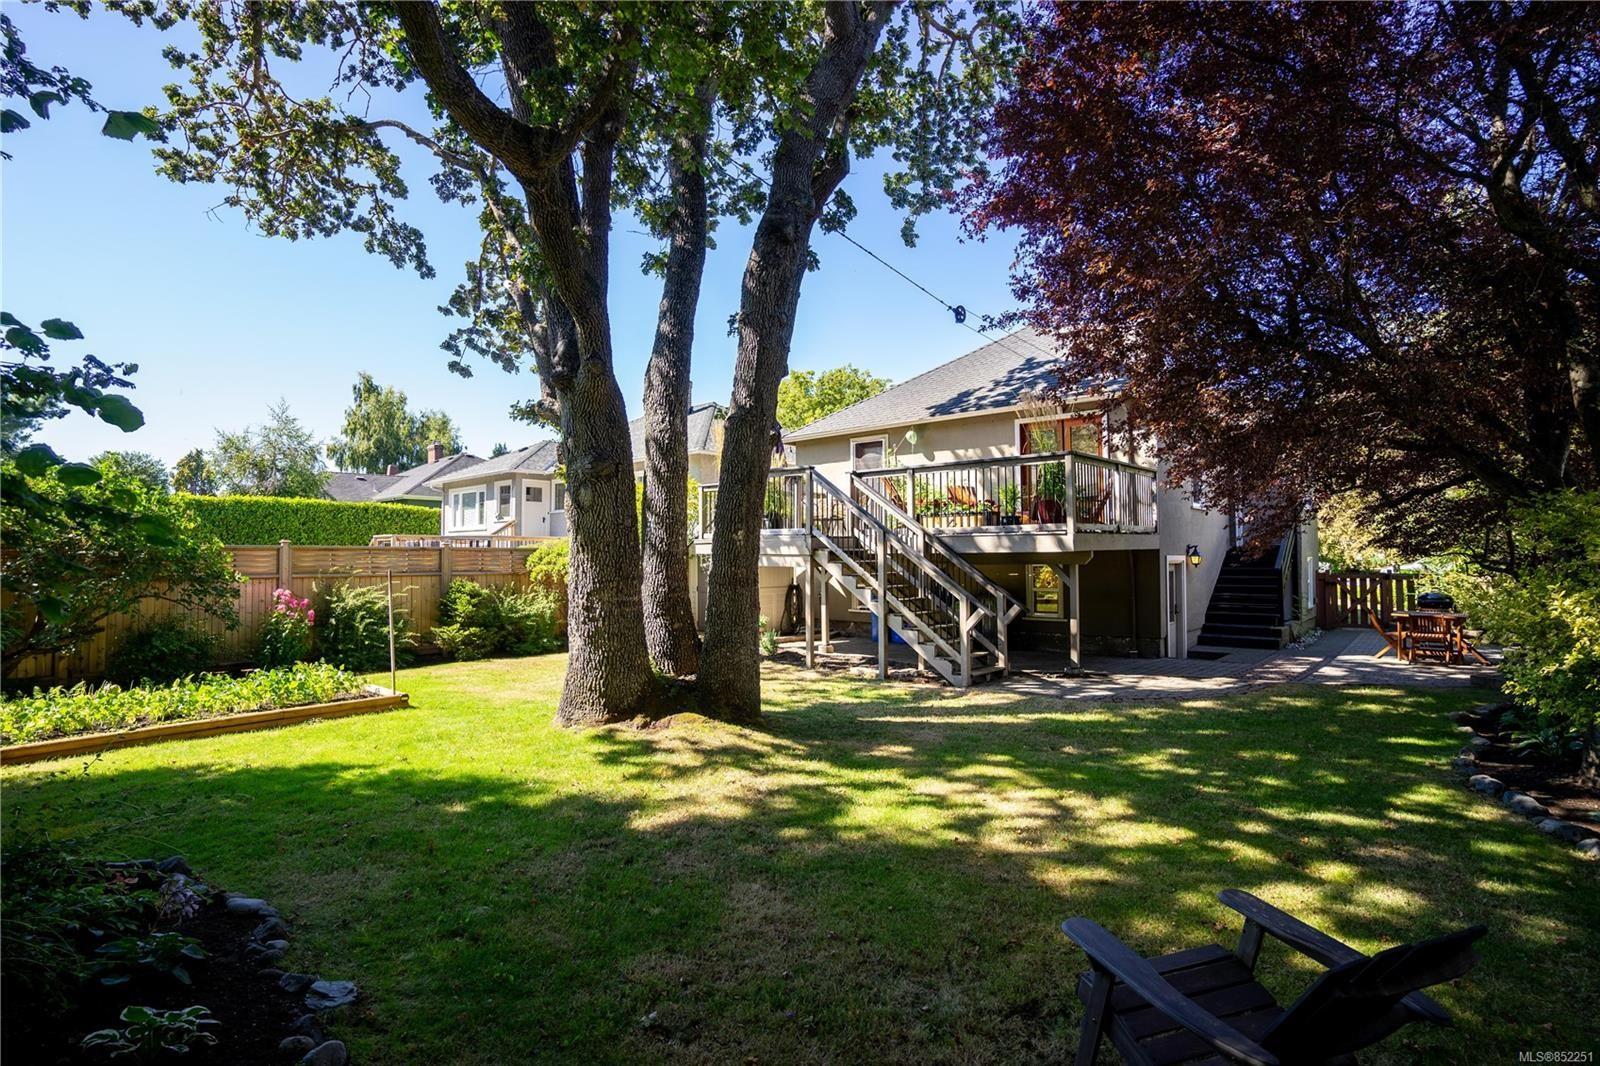 Photo 31: Photos: 2363 Pacific Ave in : OB Estevan House for sale (Oak Bay)  : MLS®# 852251